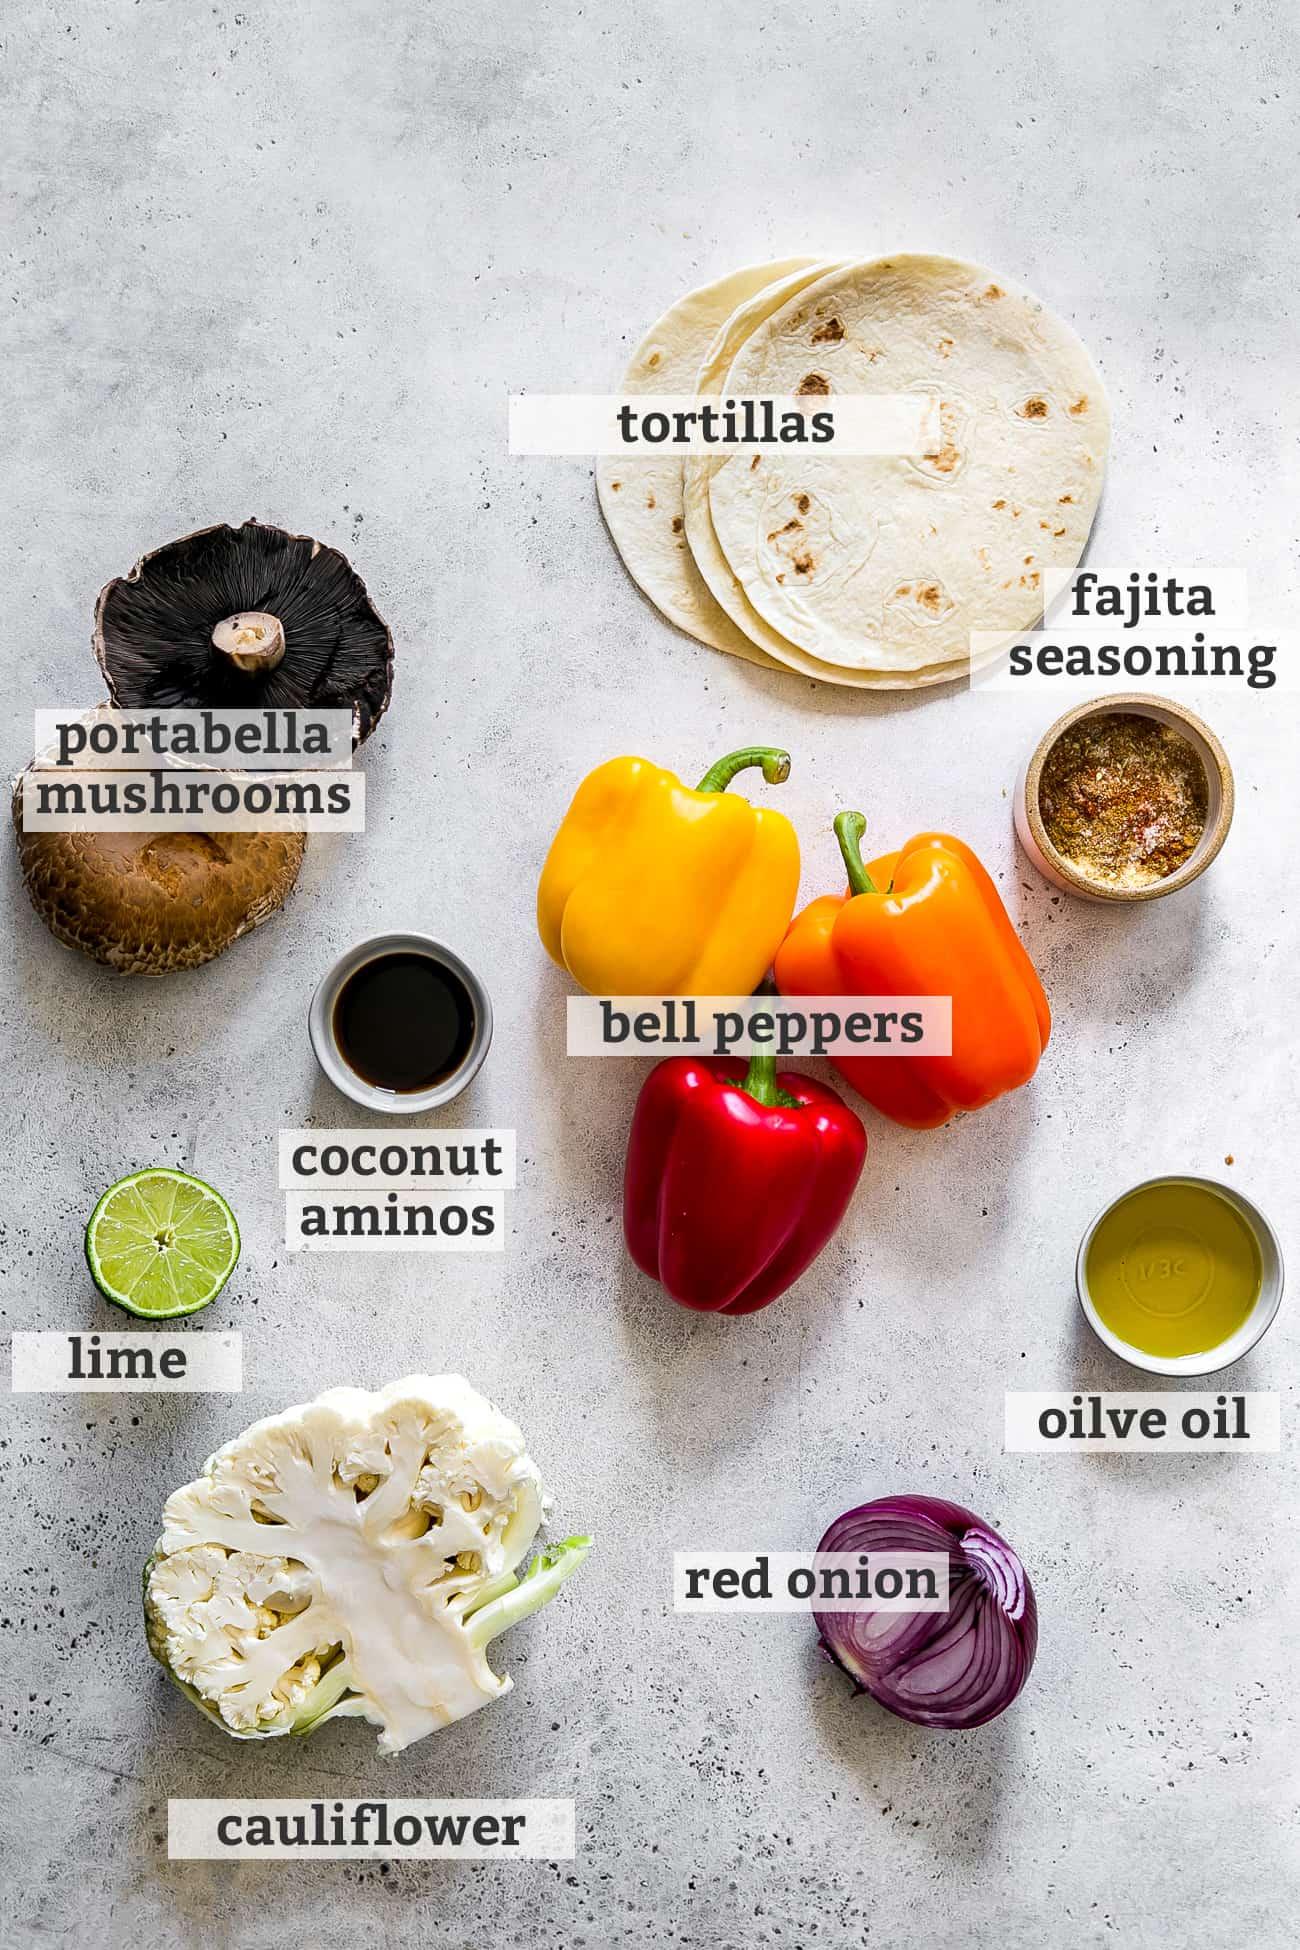 ingredients for sheet pan fajita vegetables; portabella musrooms, tortillas, fajita seasoning, bell peppers, coconut aminos, lime, cauliflower, red onion and olive oil